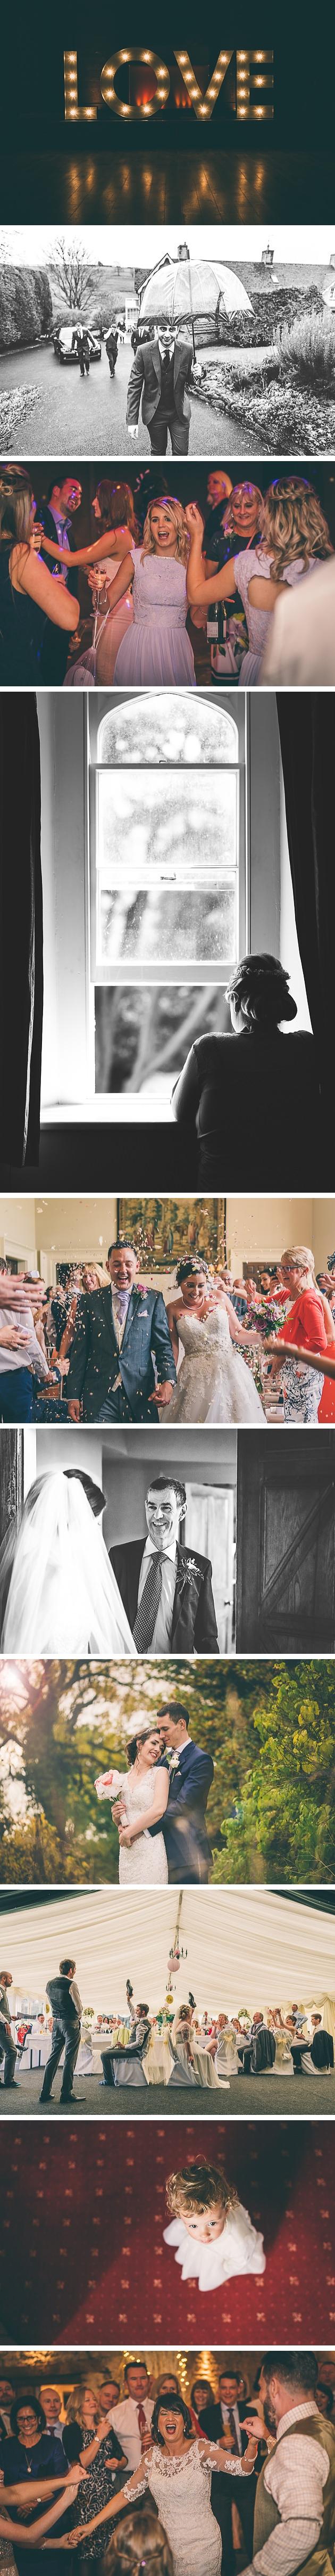 Rob Tarren Photography Weddings 2016